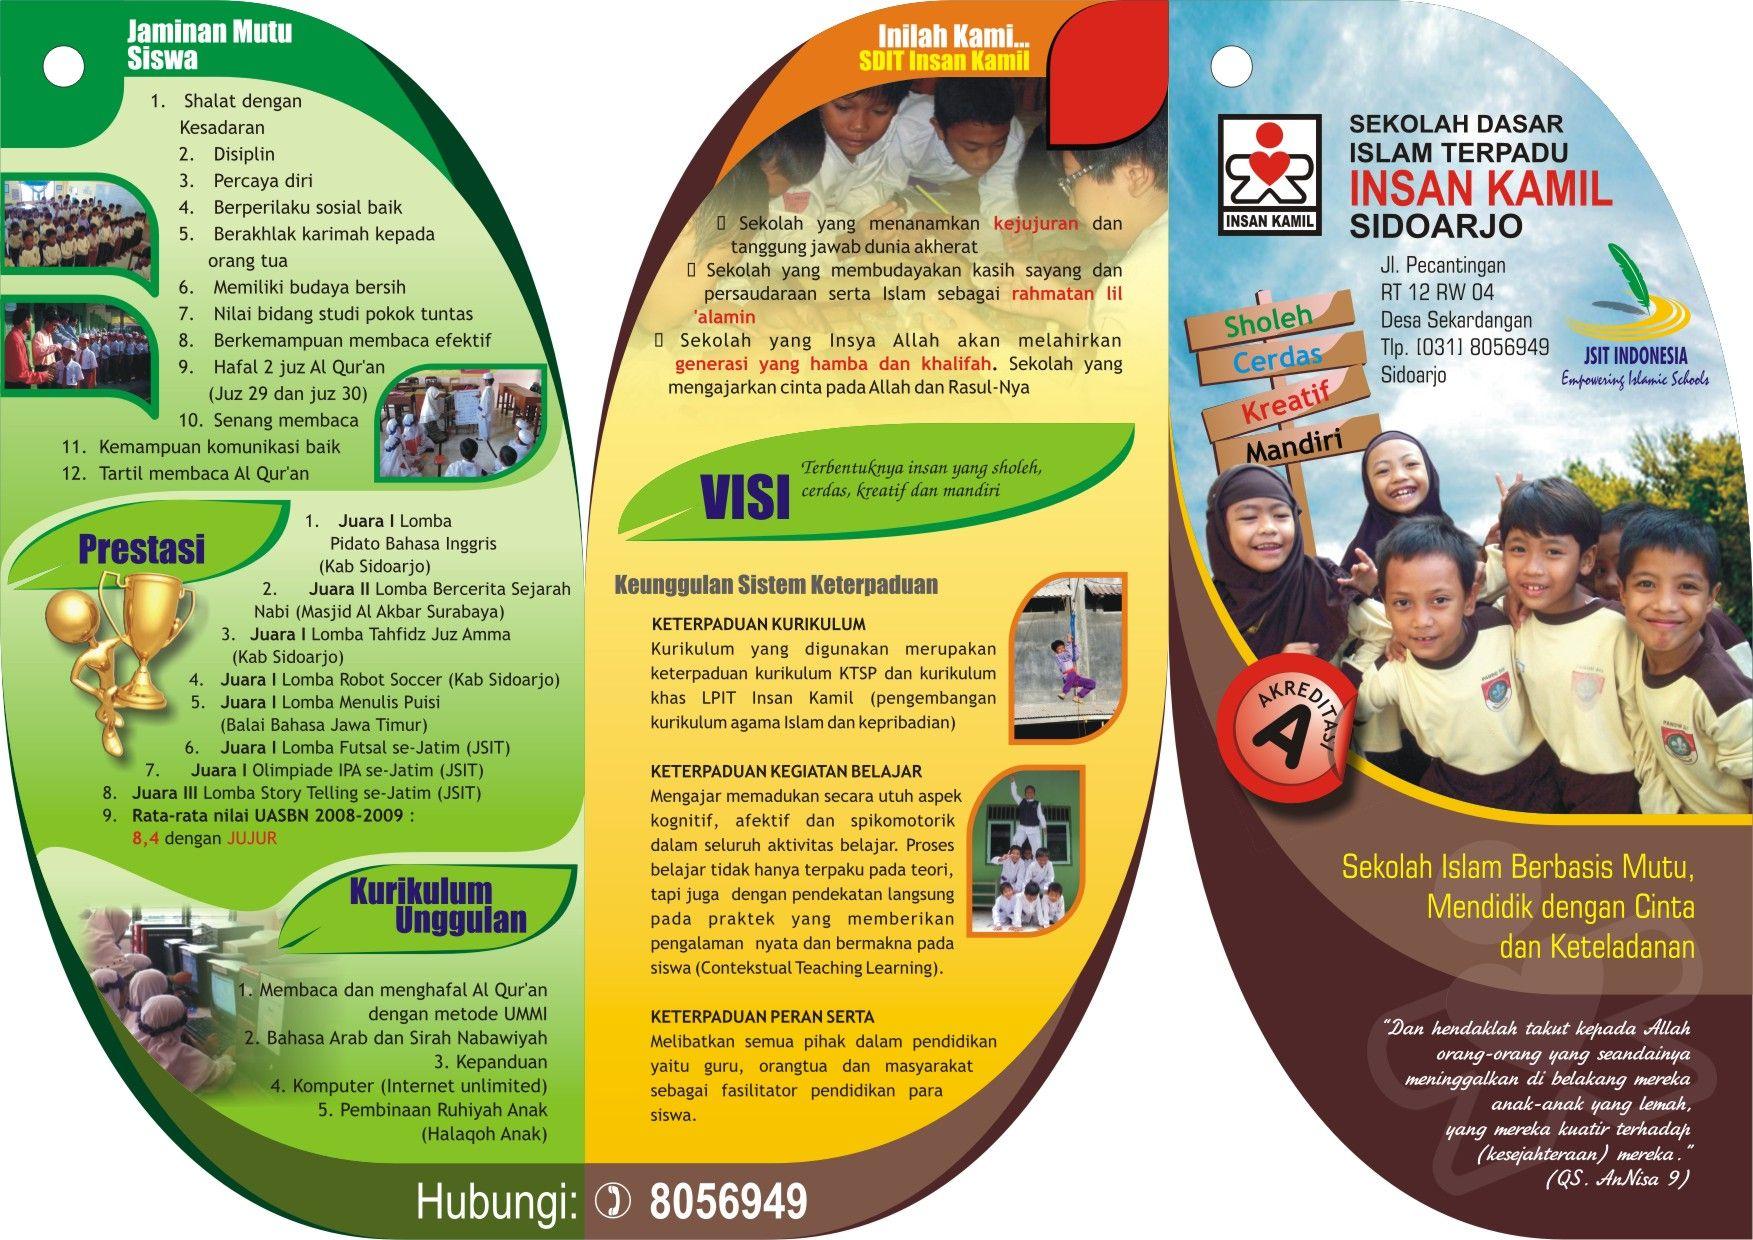 Call Wa 081 803020 853 Biaya Cetak Stiker Murah Surabaya